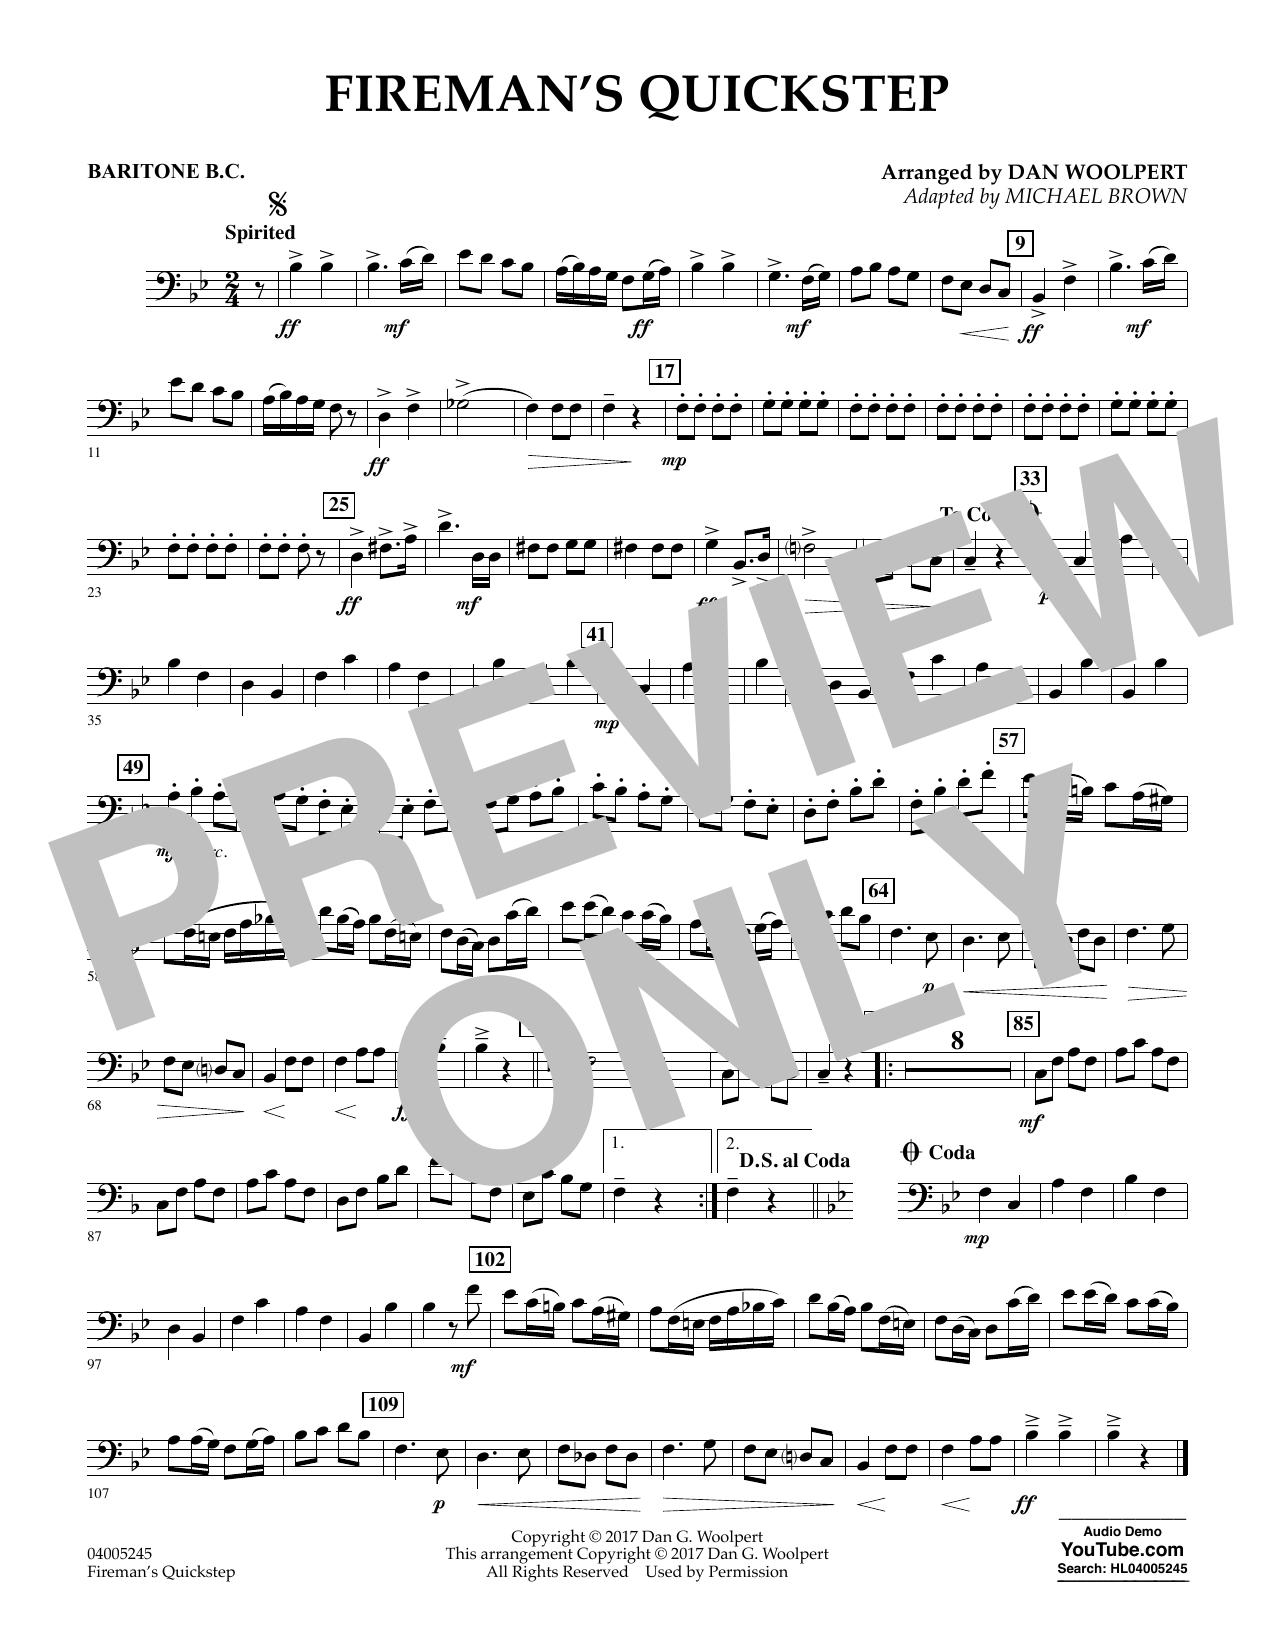 Fireman's Quickstep - Baritone B.C. (Concert Band)